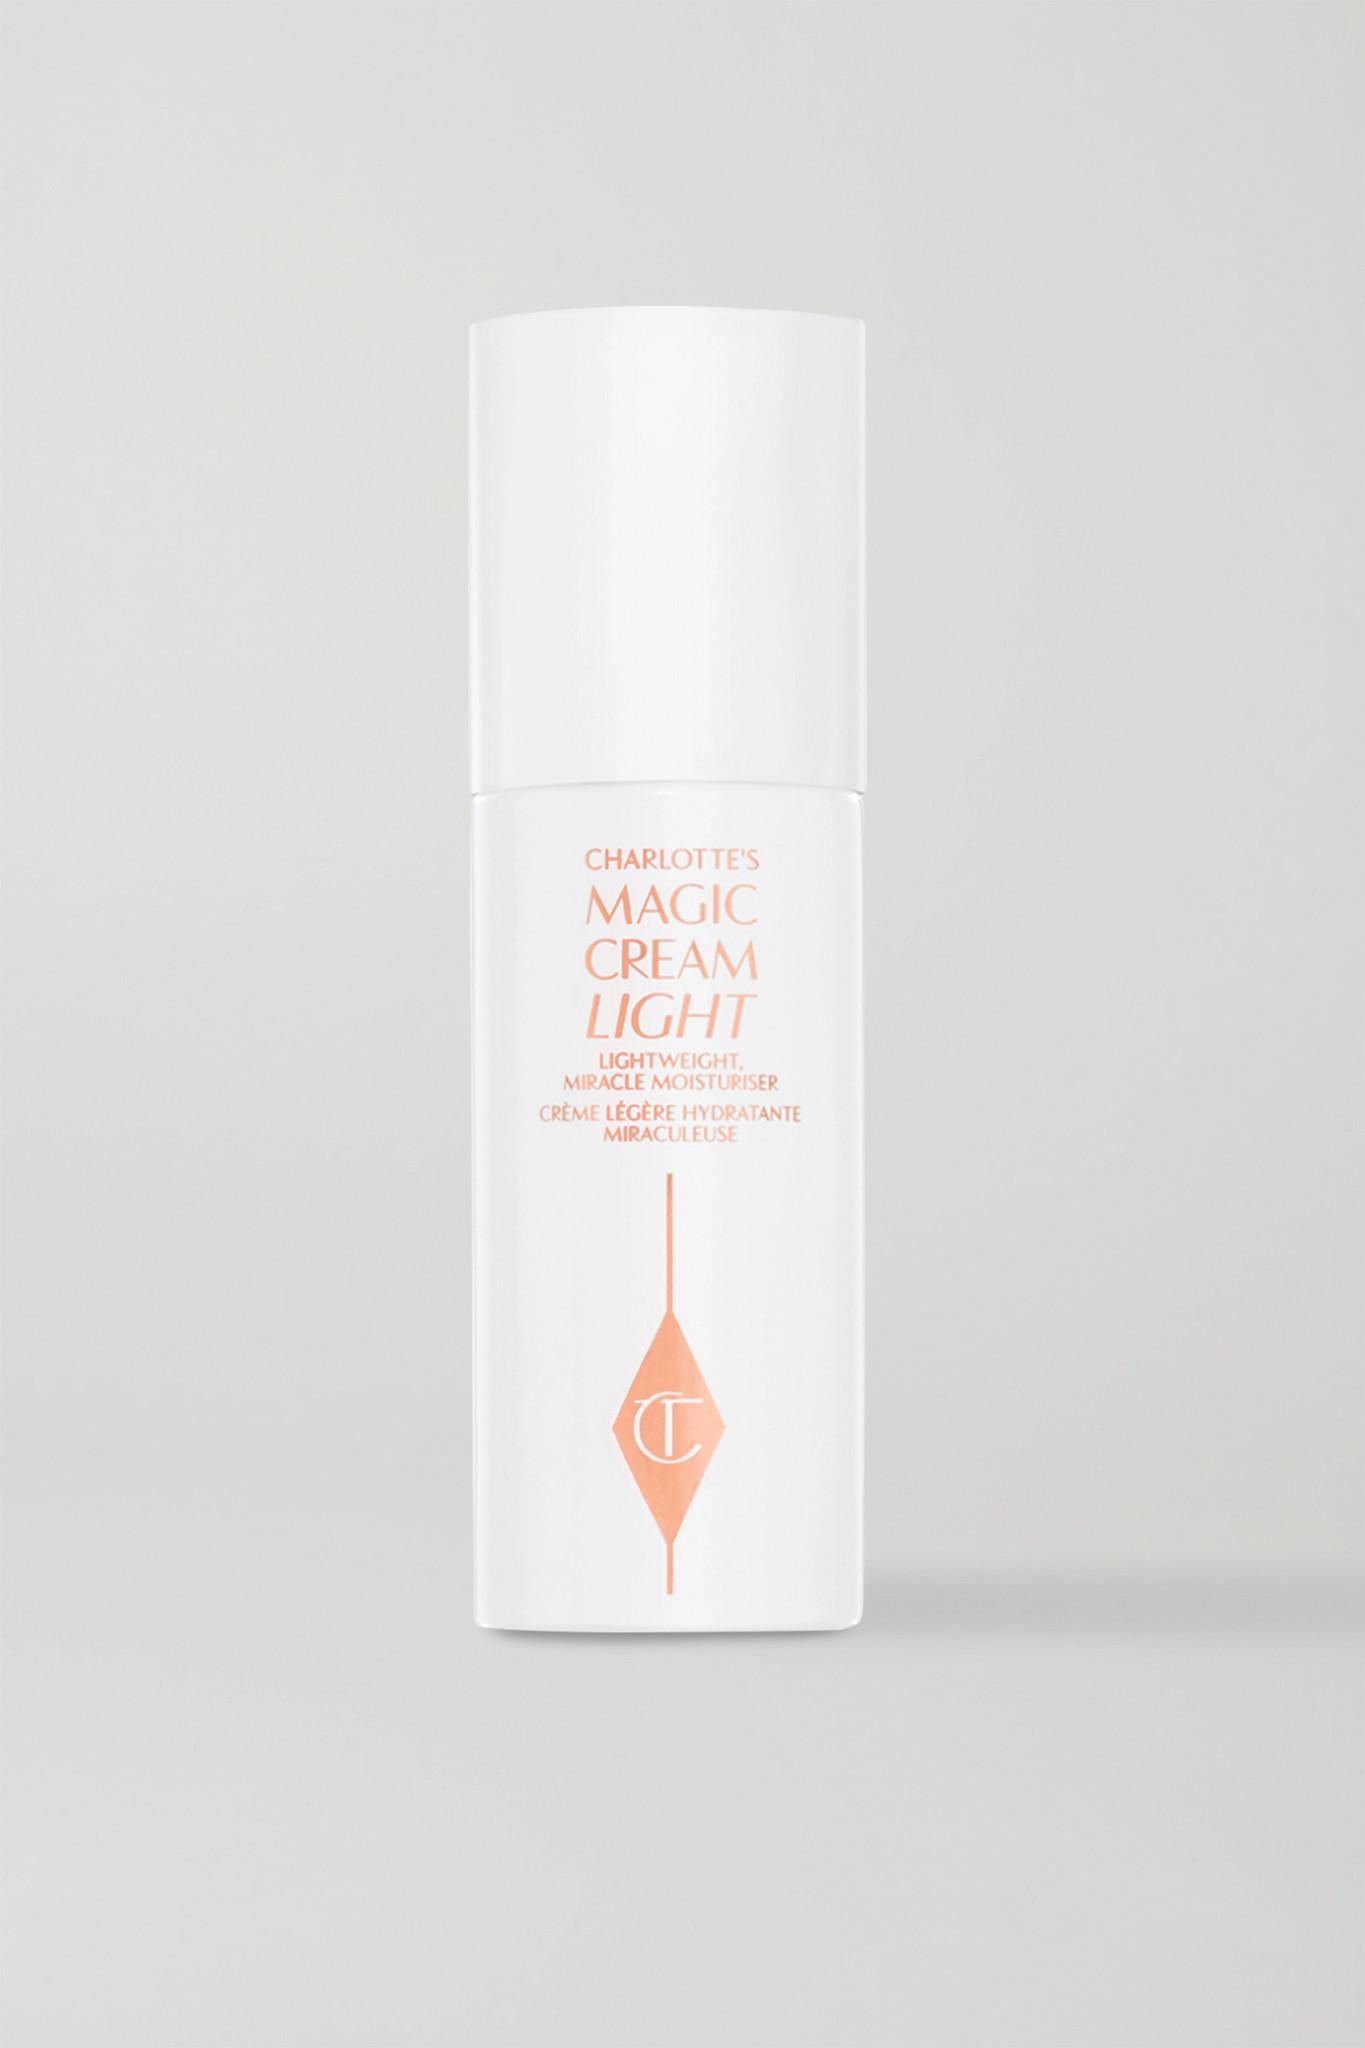 CHARLOTTE TILBURY - Charlotte's Magic Cream Light Moisturizer, 15ml - one size